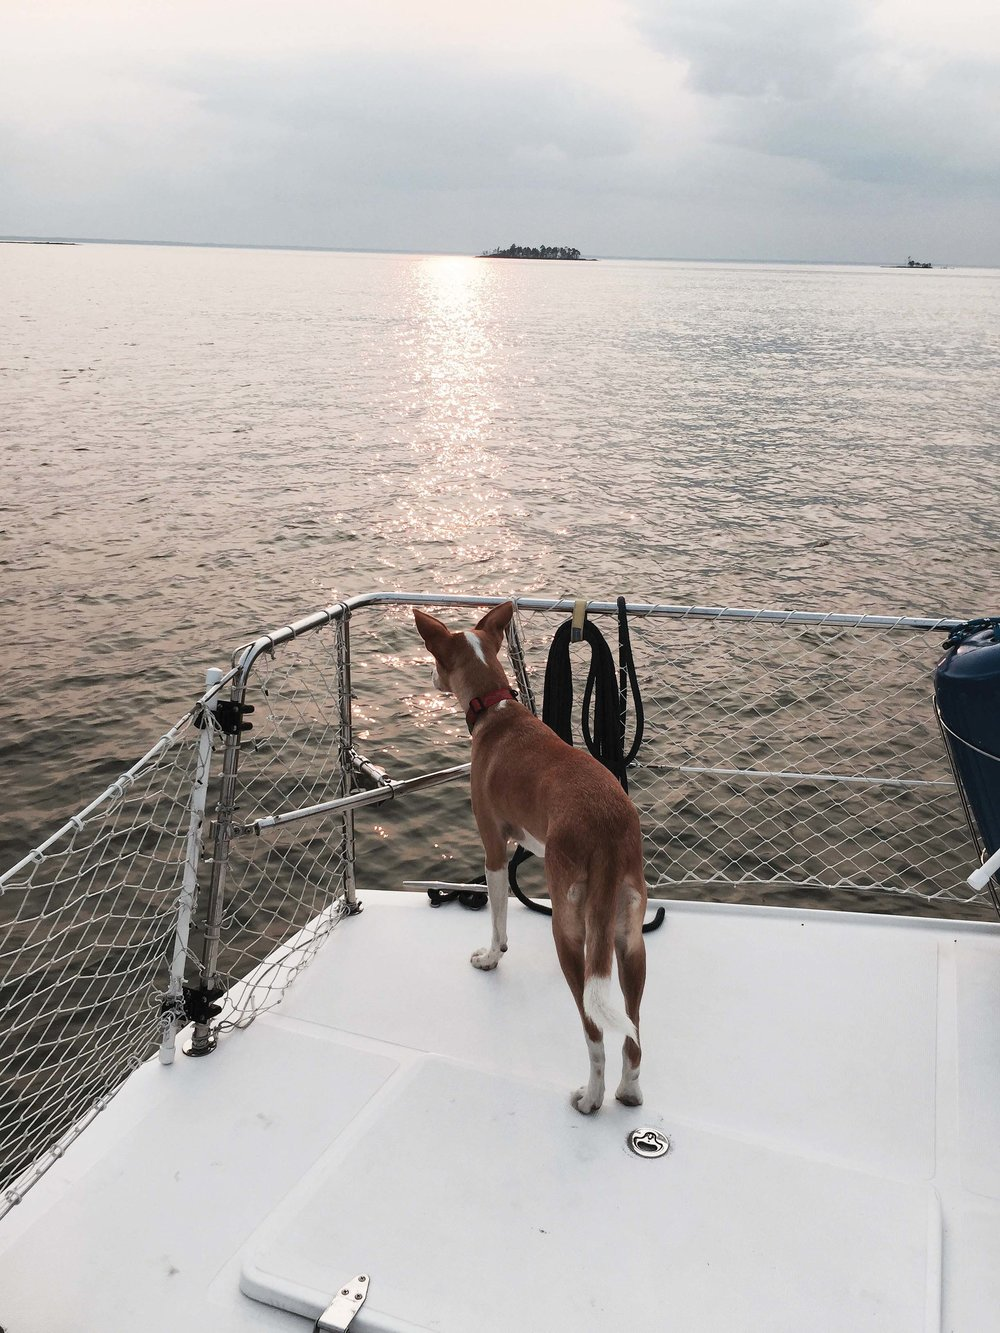 Bindi watches for horseflies at anchor near James Island. Photo by Jody Argo Schroath